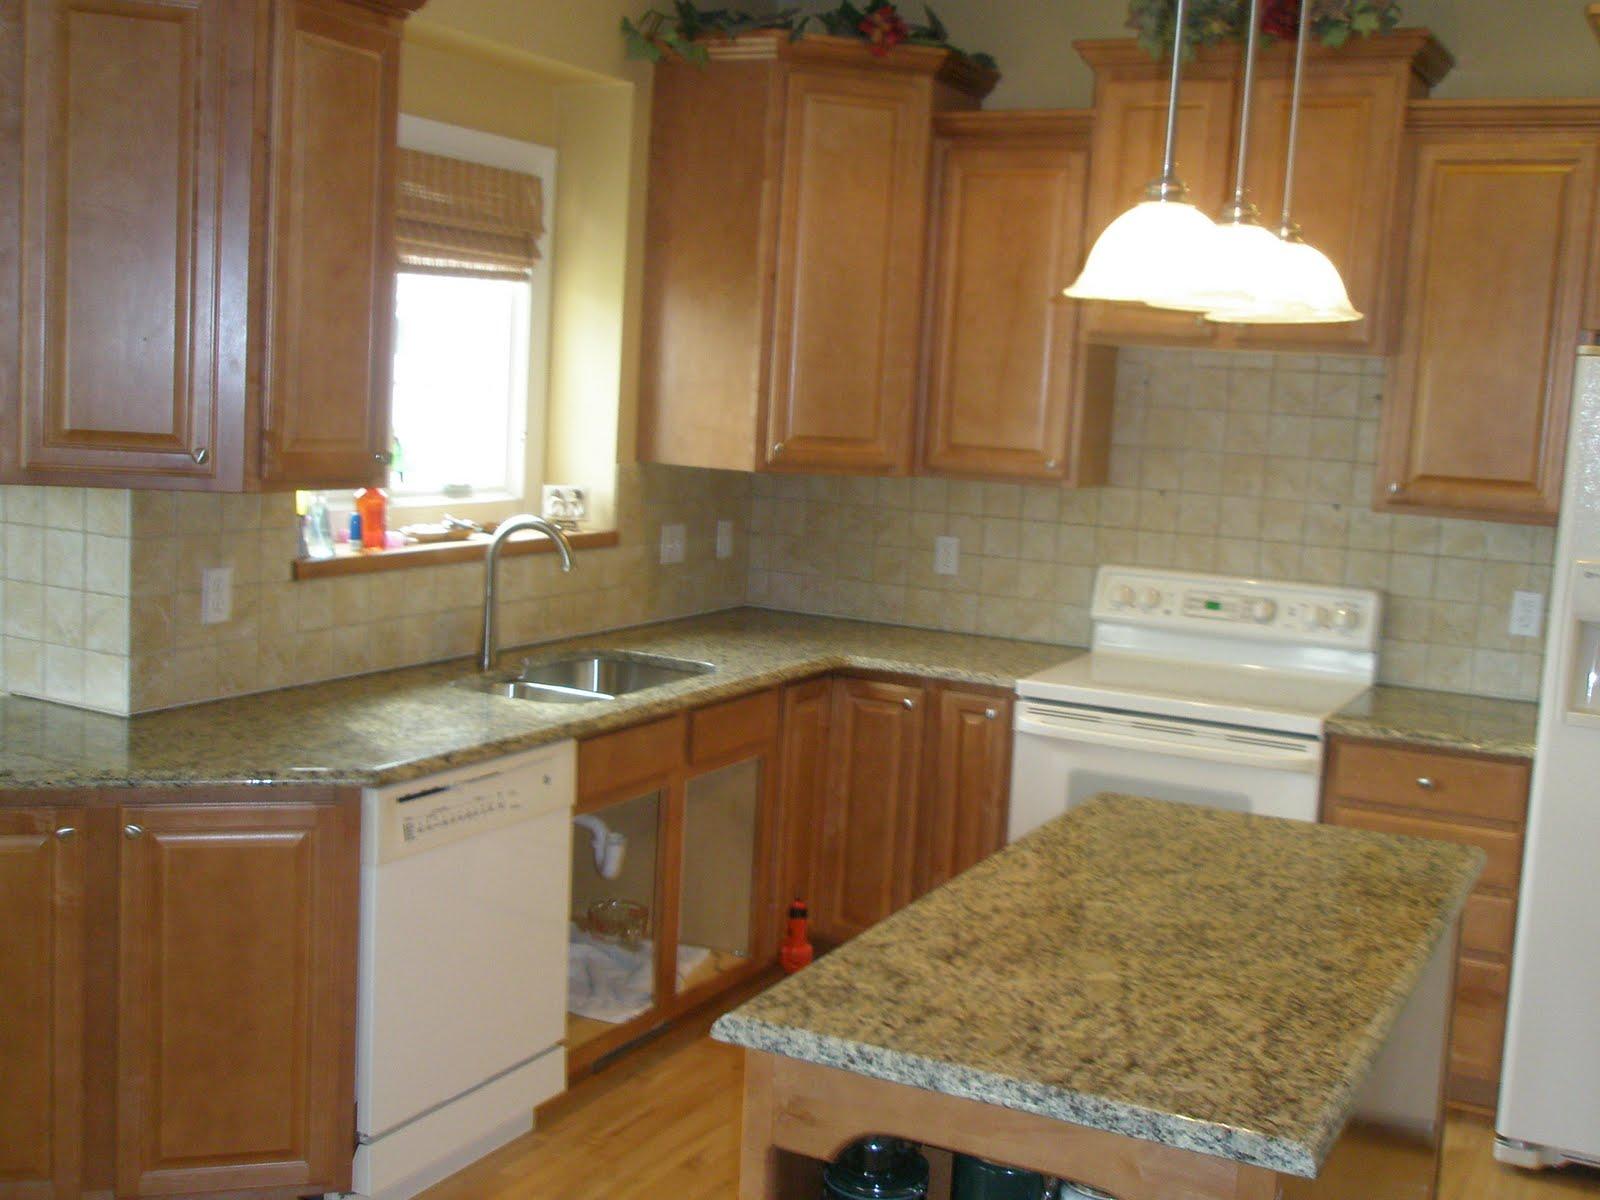 Sell kitchen appliances Photo - 10